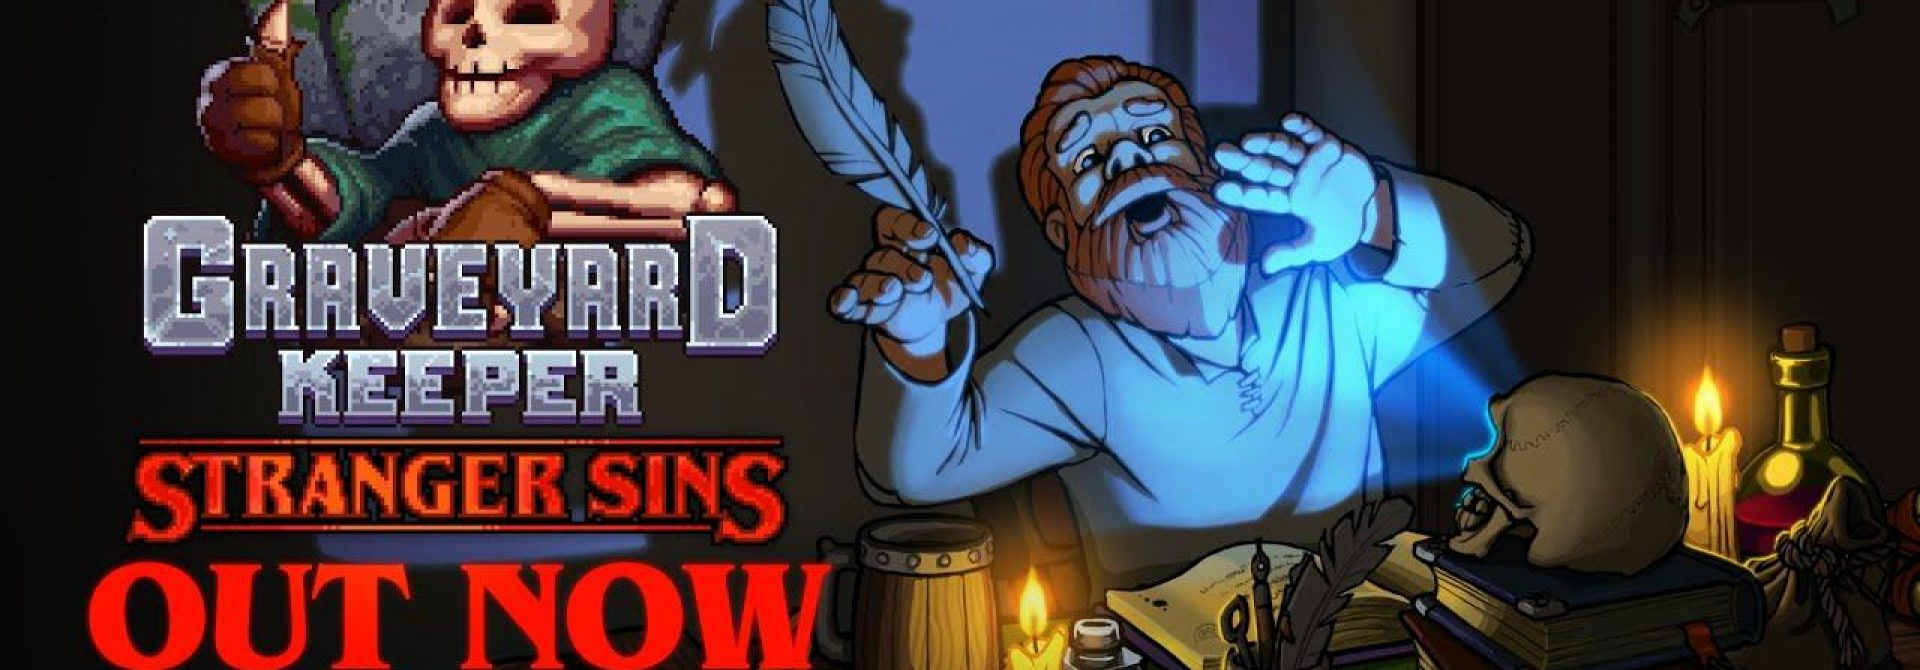 Graveyard Keeper Introduces Stranger Sins DLC